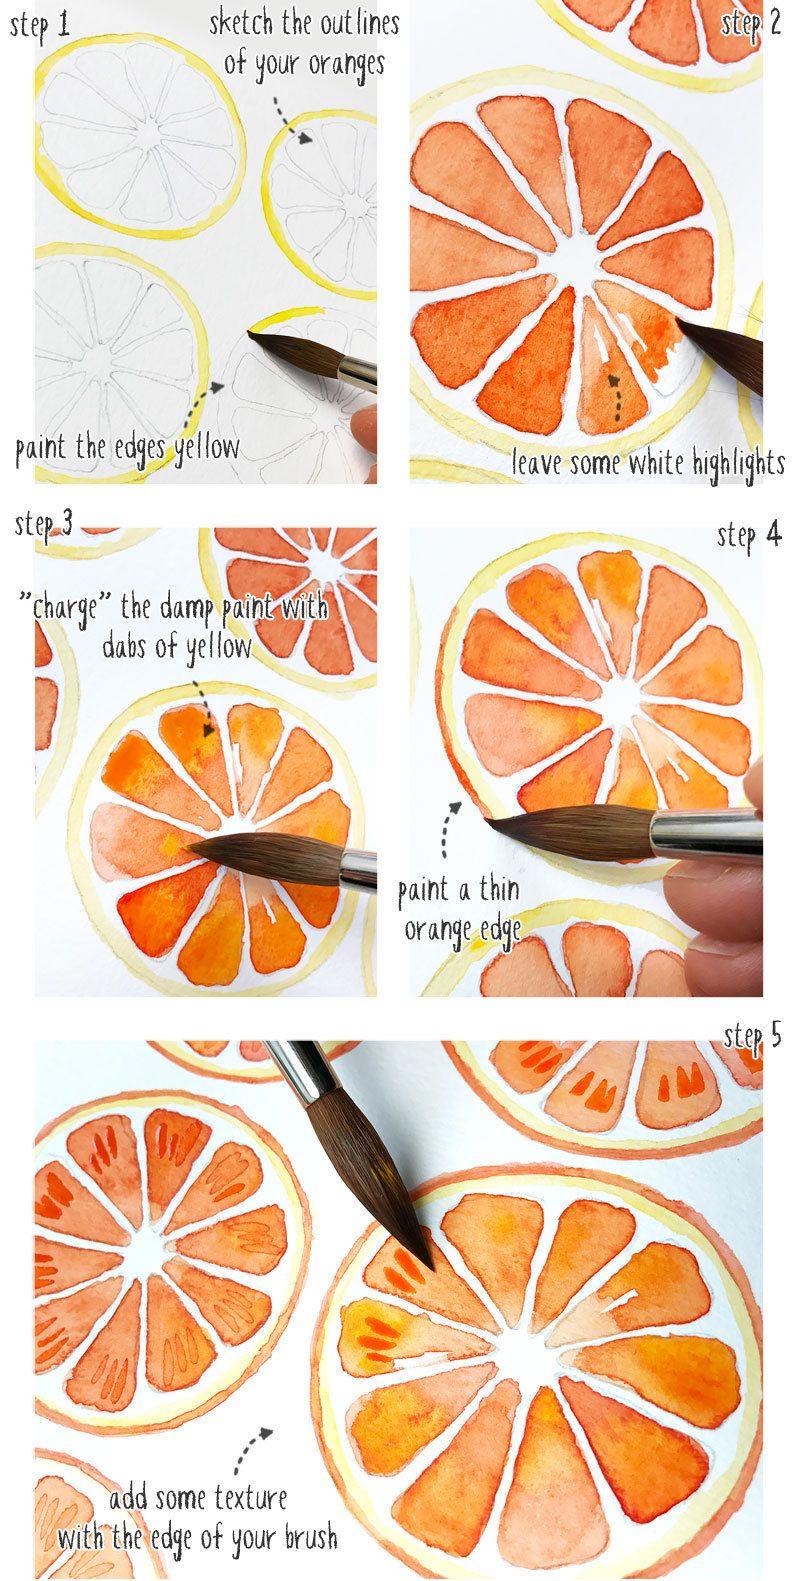 3 Easy Ways To Paint Oranges In